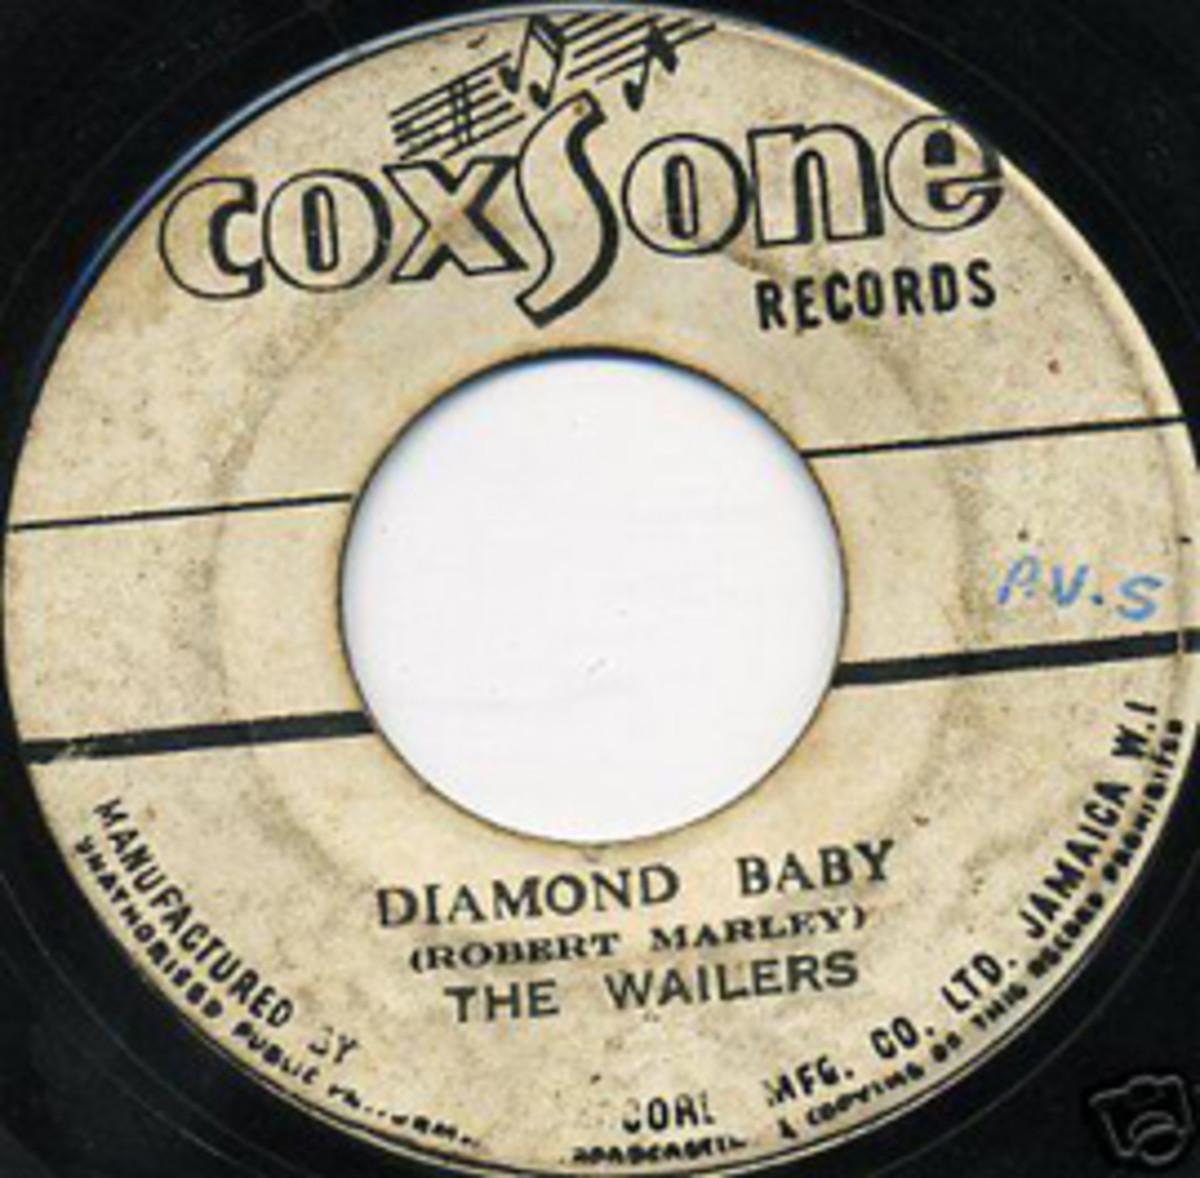 Bob Marley Diamond Baby